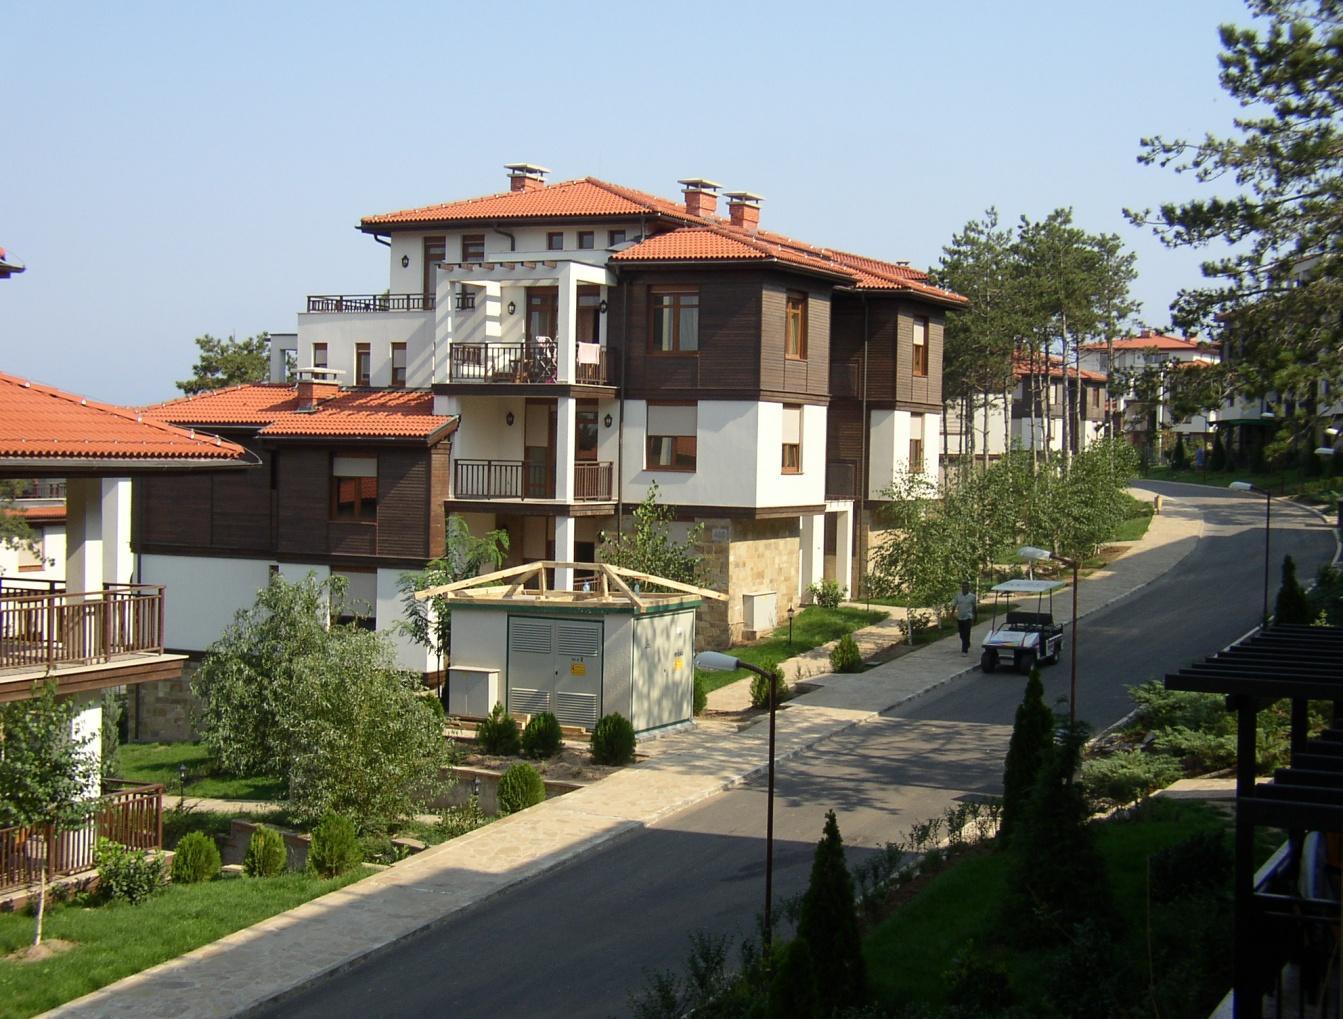 как строят в болгарии